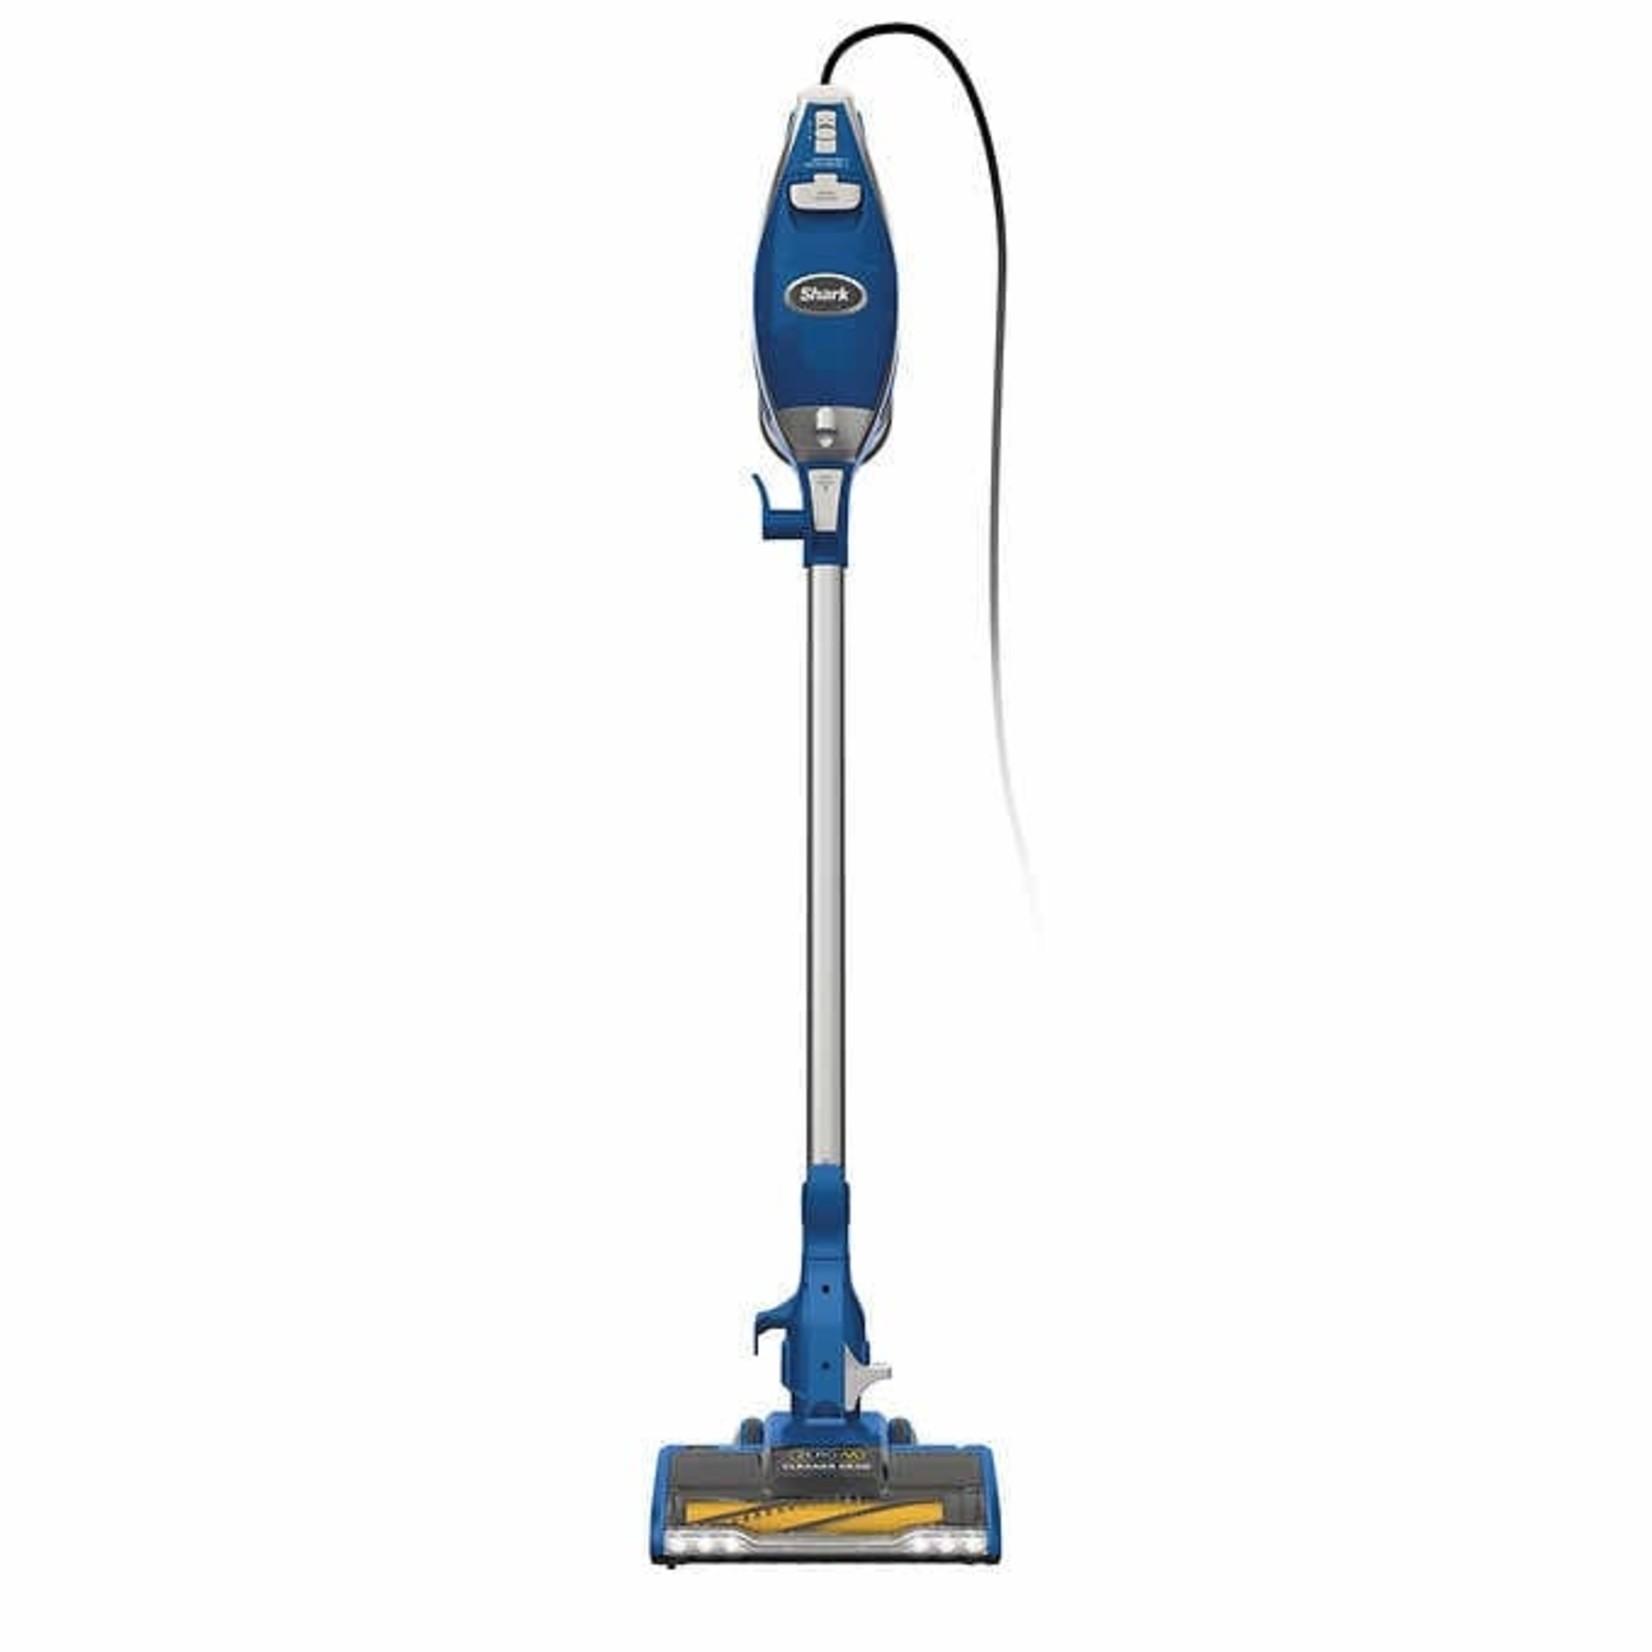 Shark Rocket Self-Cleaning Brushroll Corded Stick Vacuum UV345CCO